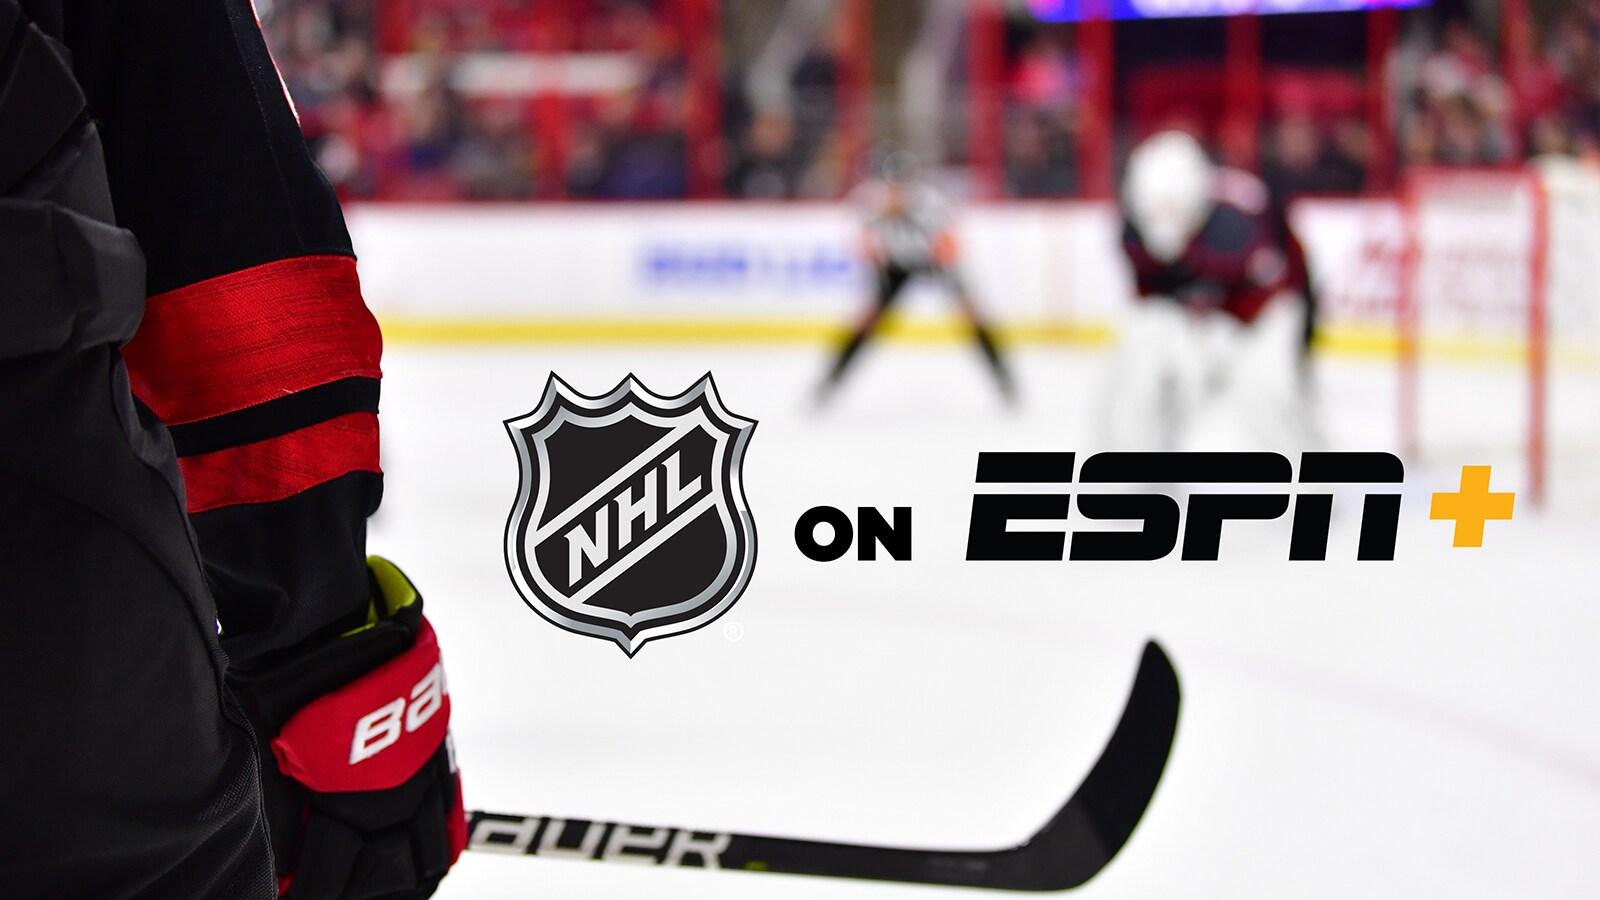 TSN's 'Free Agent Frenzy' Live on ESPN+